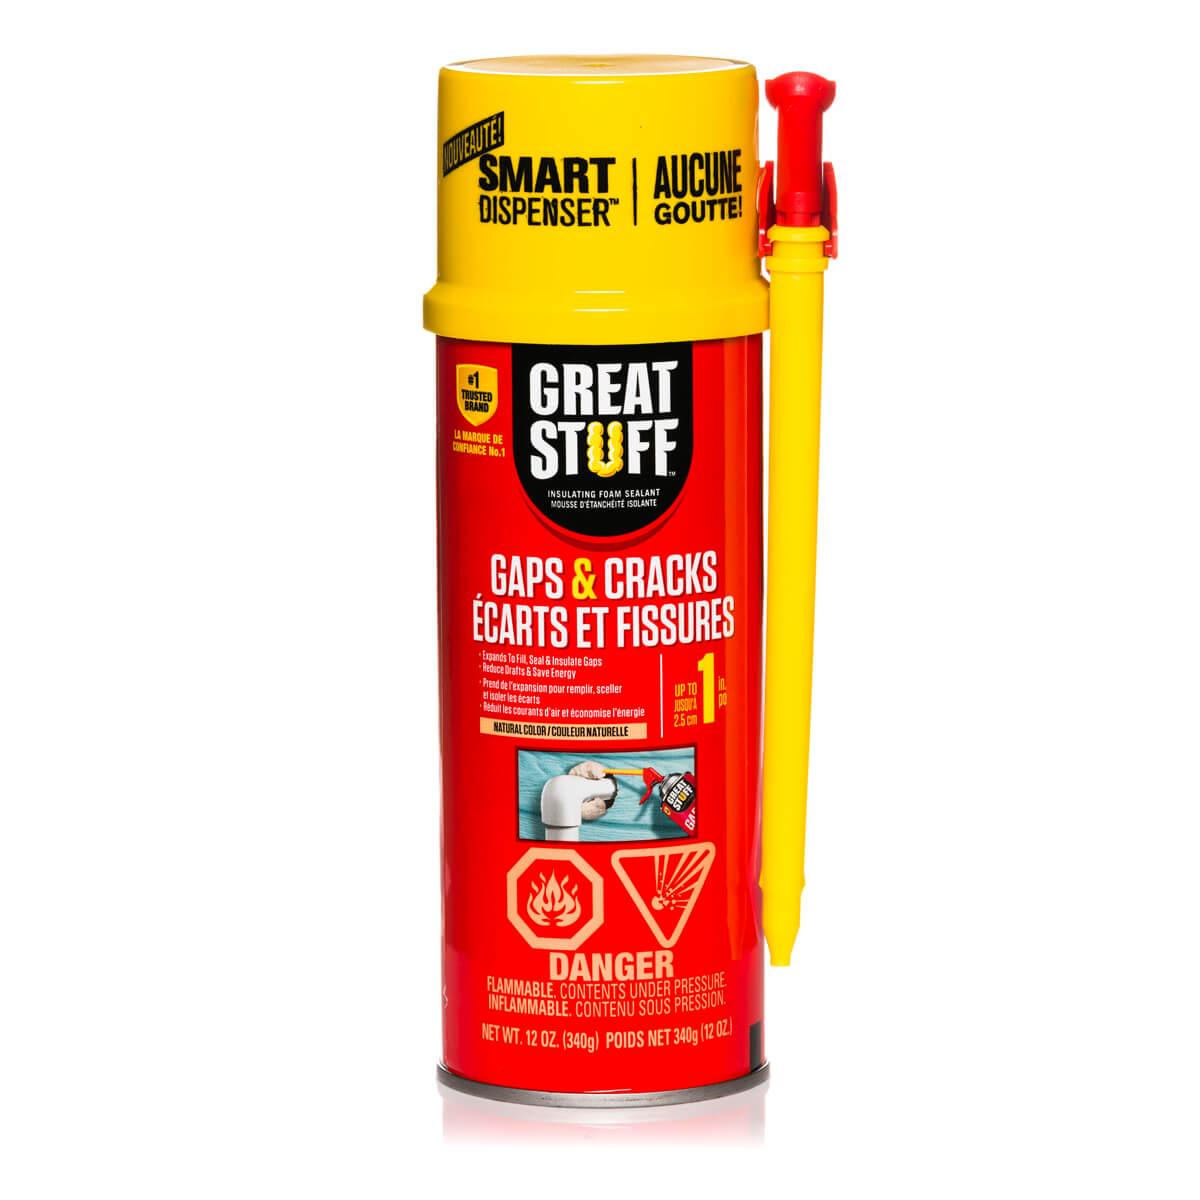 Great Stuff Insulating Foam - Gaps and Cracks - Cream - 12 oz